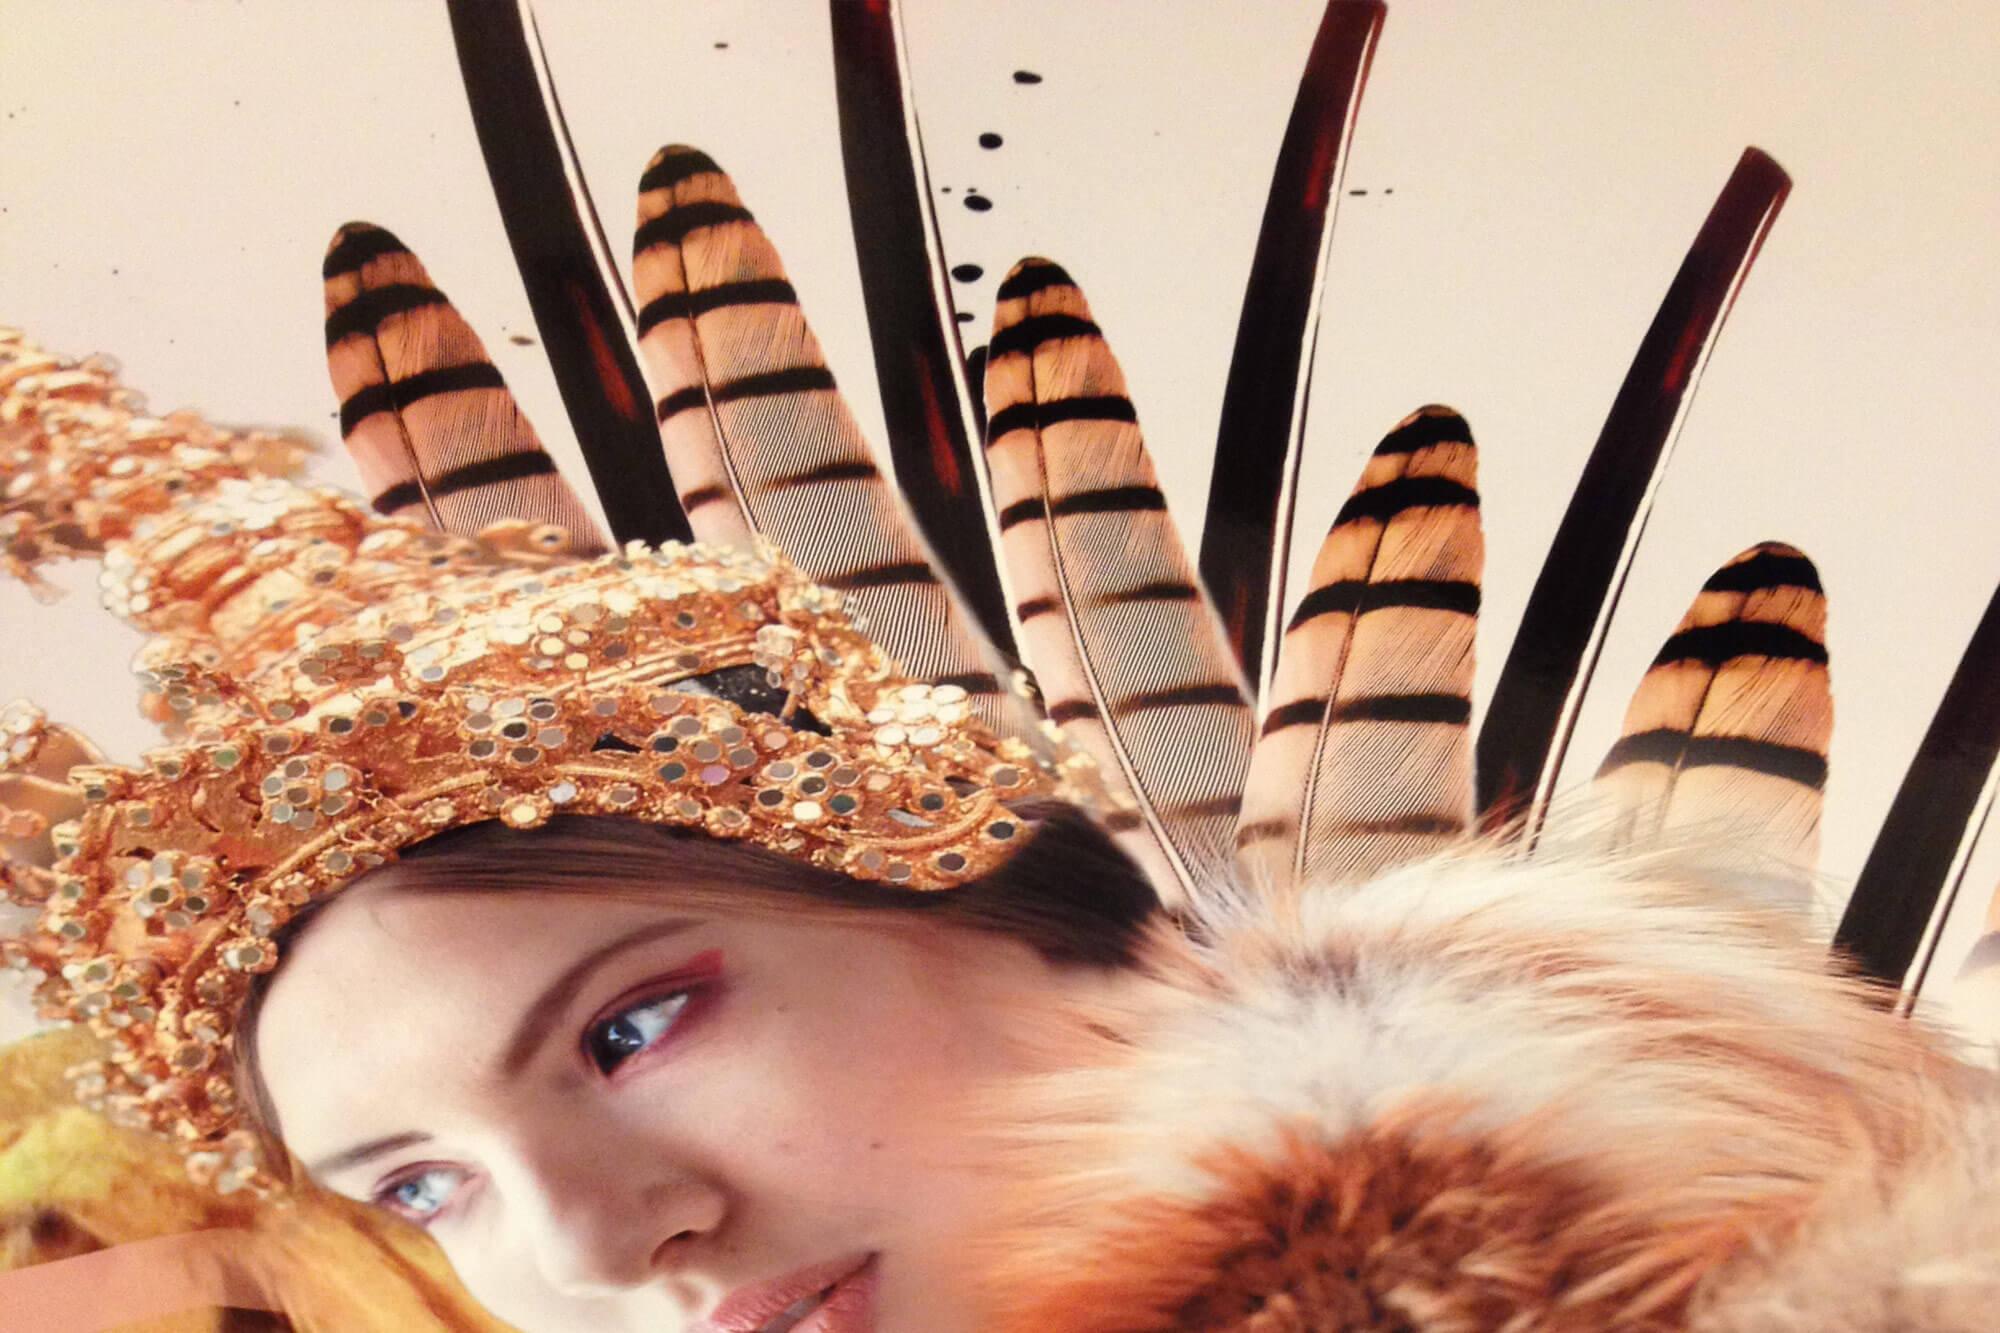 gareth-paul-jones-studio-design-neringa-rekasiute-photography-7788-art-identity-series-cs-09